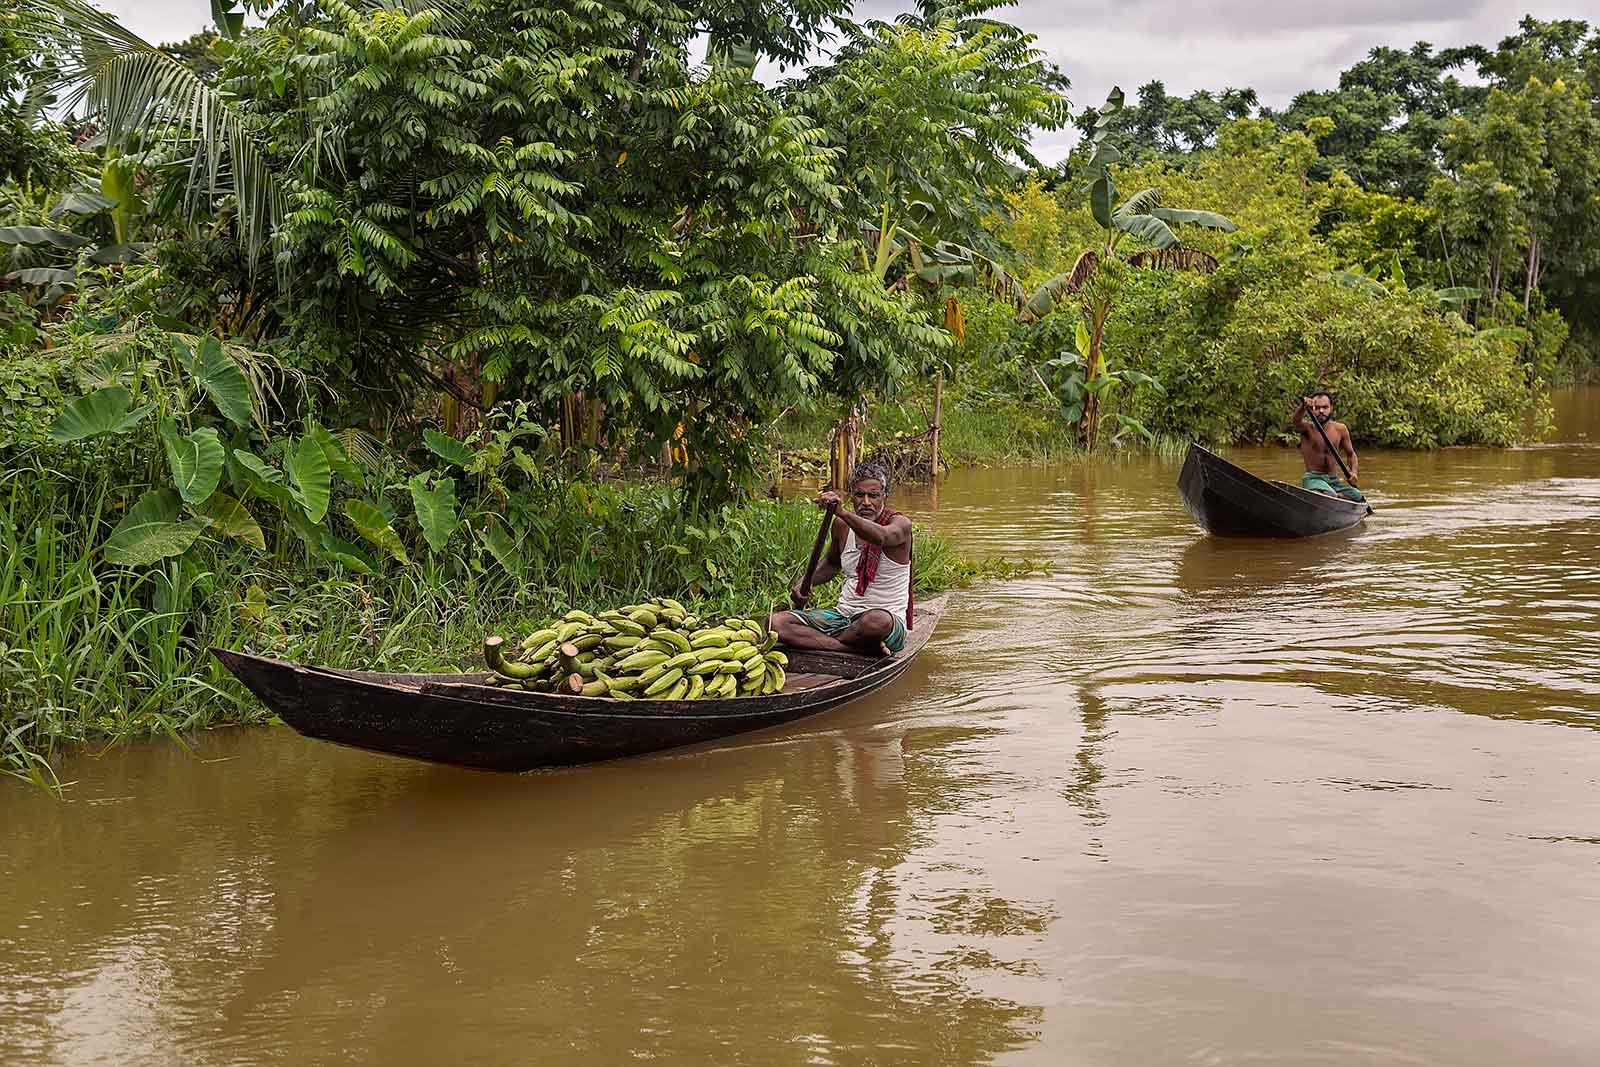 guava-plantations-boat-canal-swarupkathi-bangladesh-1